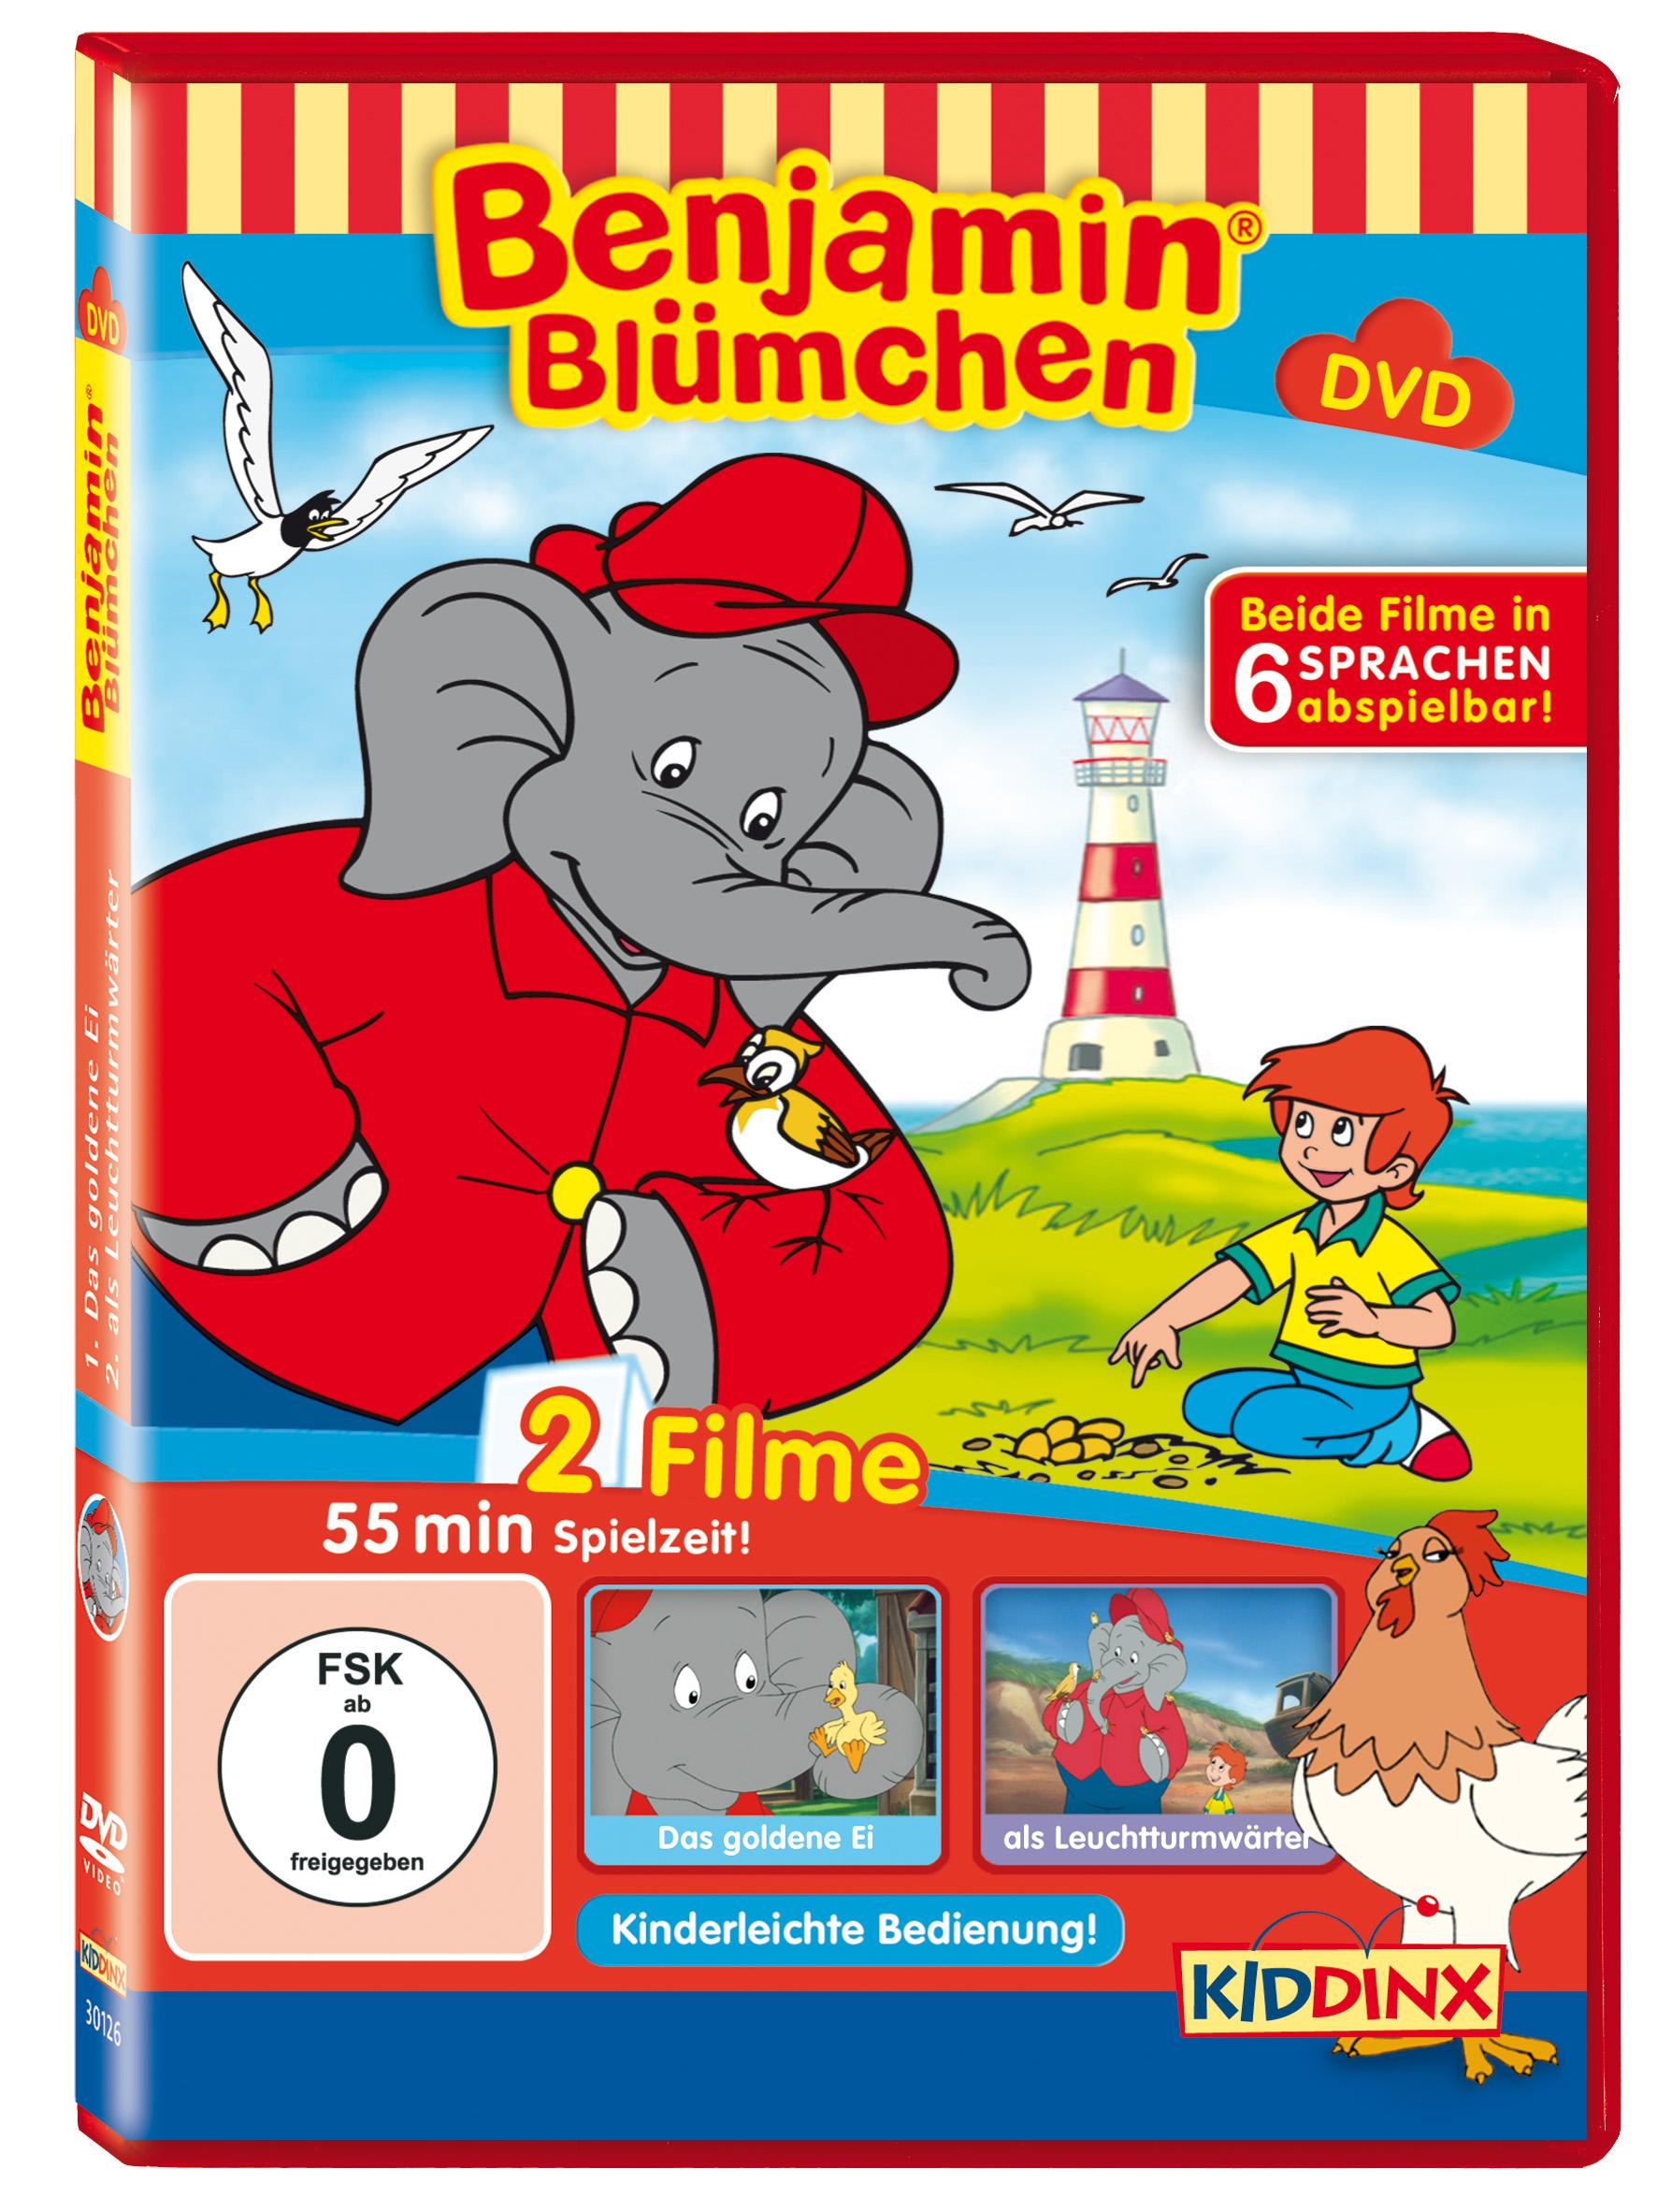 Benjamin Blümchen: Das goldene Ei / ... als Leu...